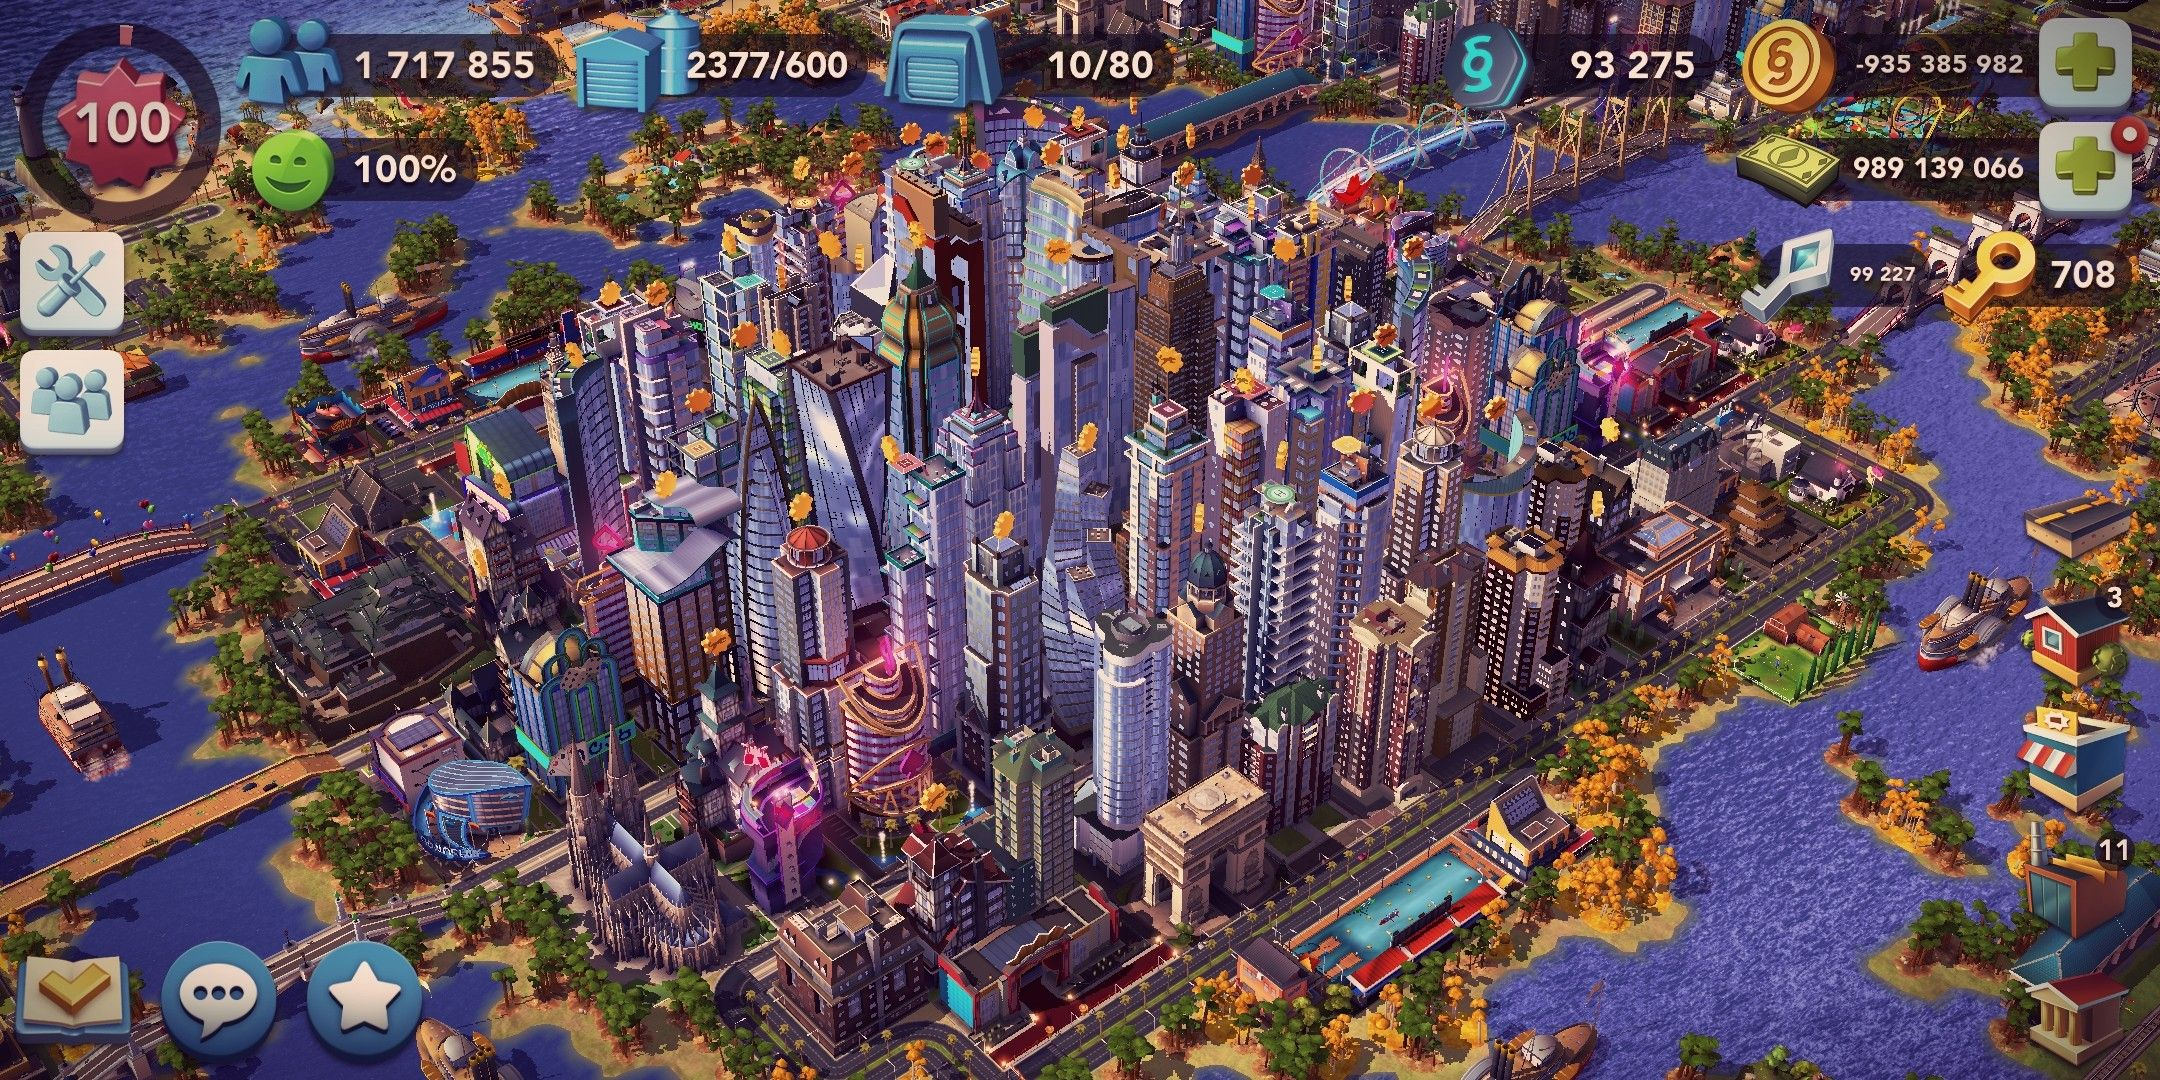 Simcity buildit cheats android forum | Simcity Buildit Hack